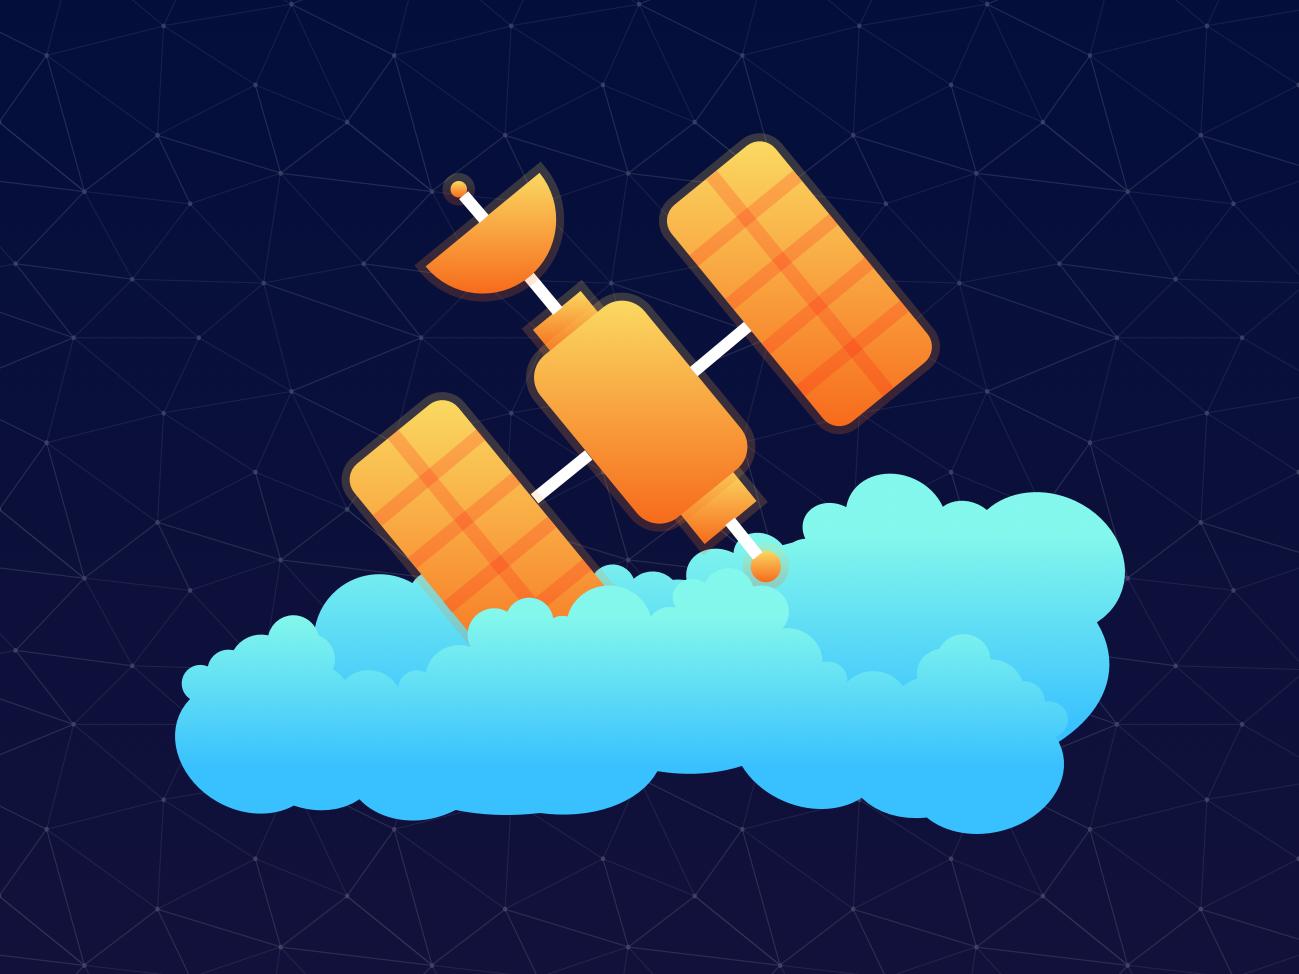 Satellite satellite clouds galaxy vector sky stars space adobe illustrator illustration